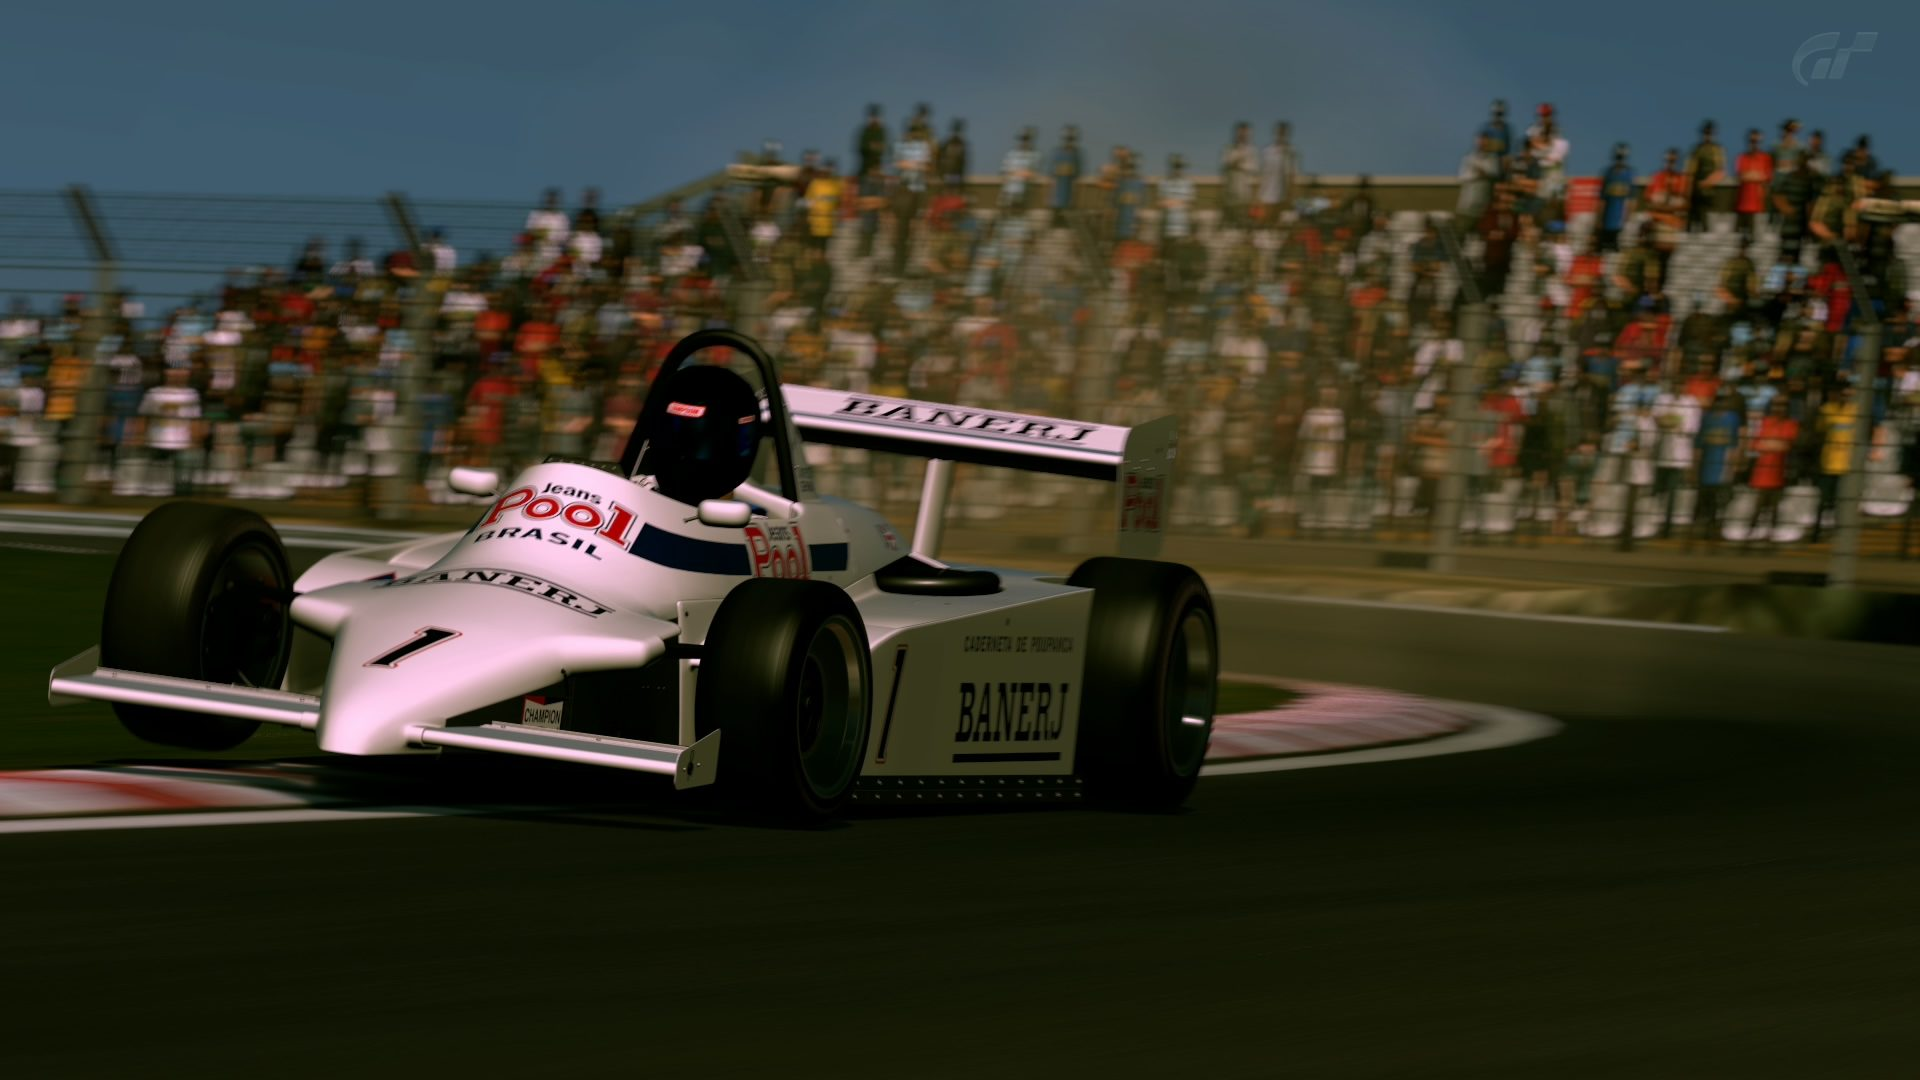 Brands Hatch Indy Circuit - Anni 80_1.jpg